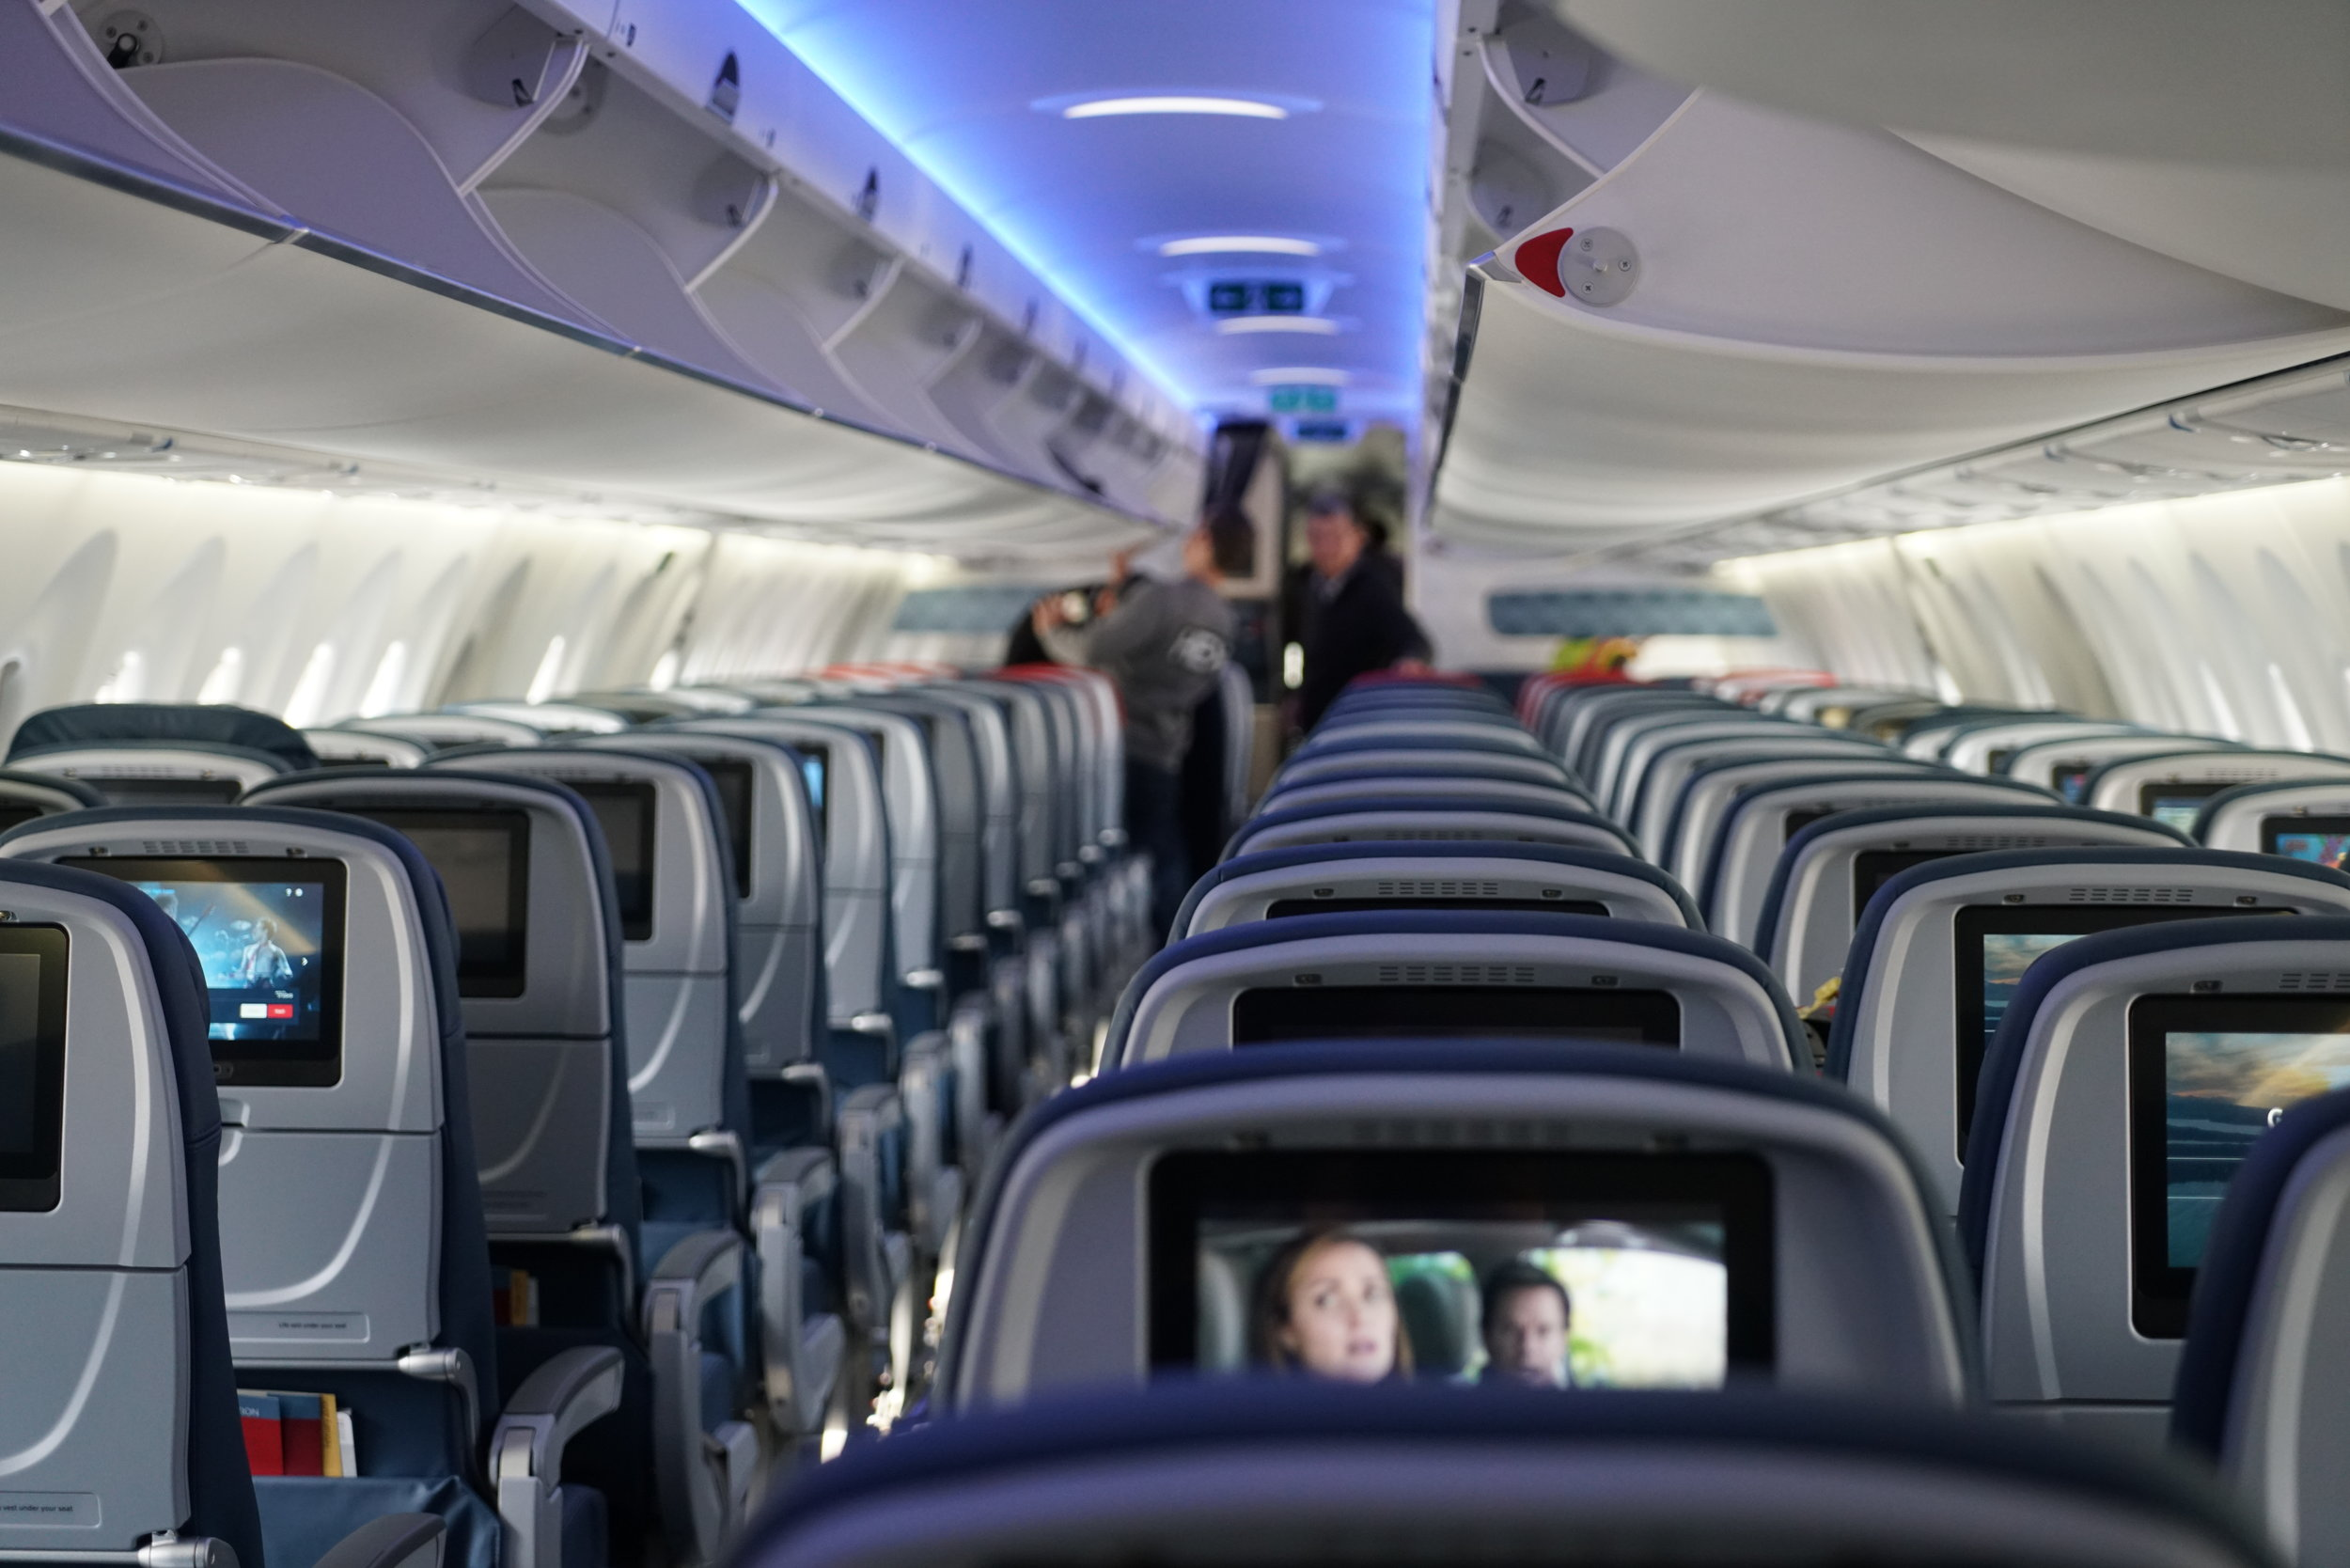 Delta A220 Seats and bins.JPG